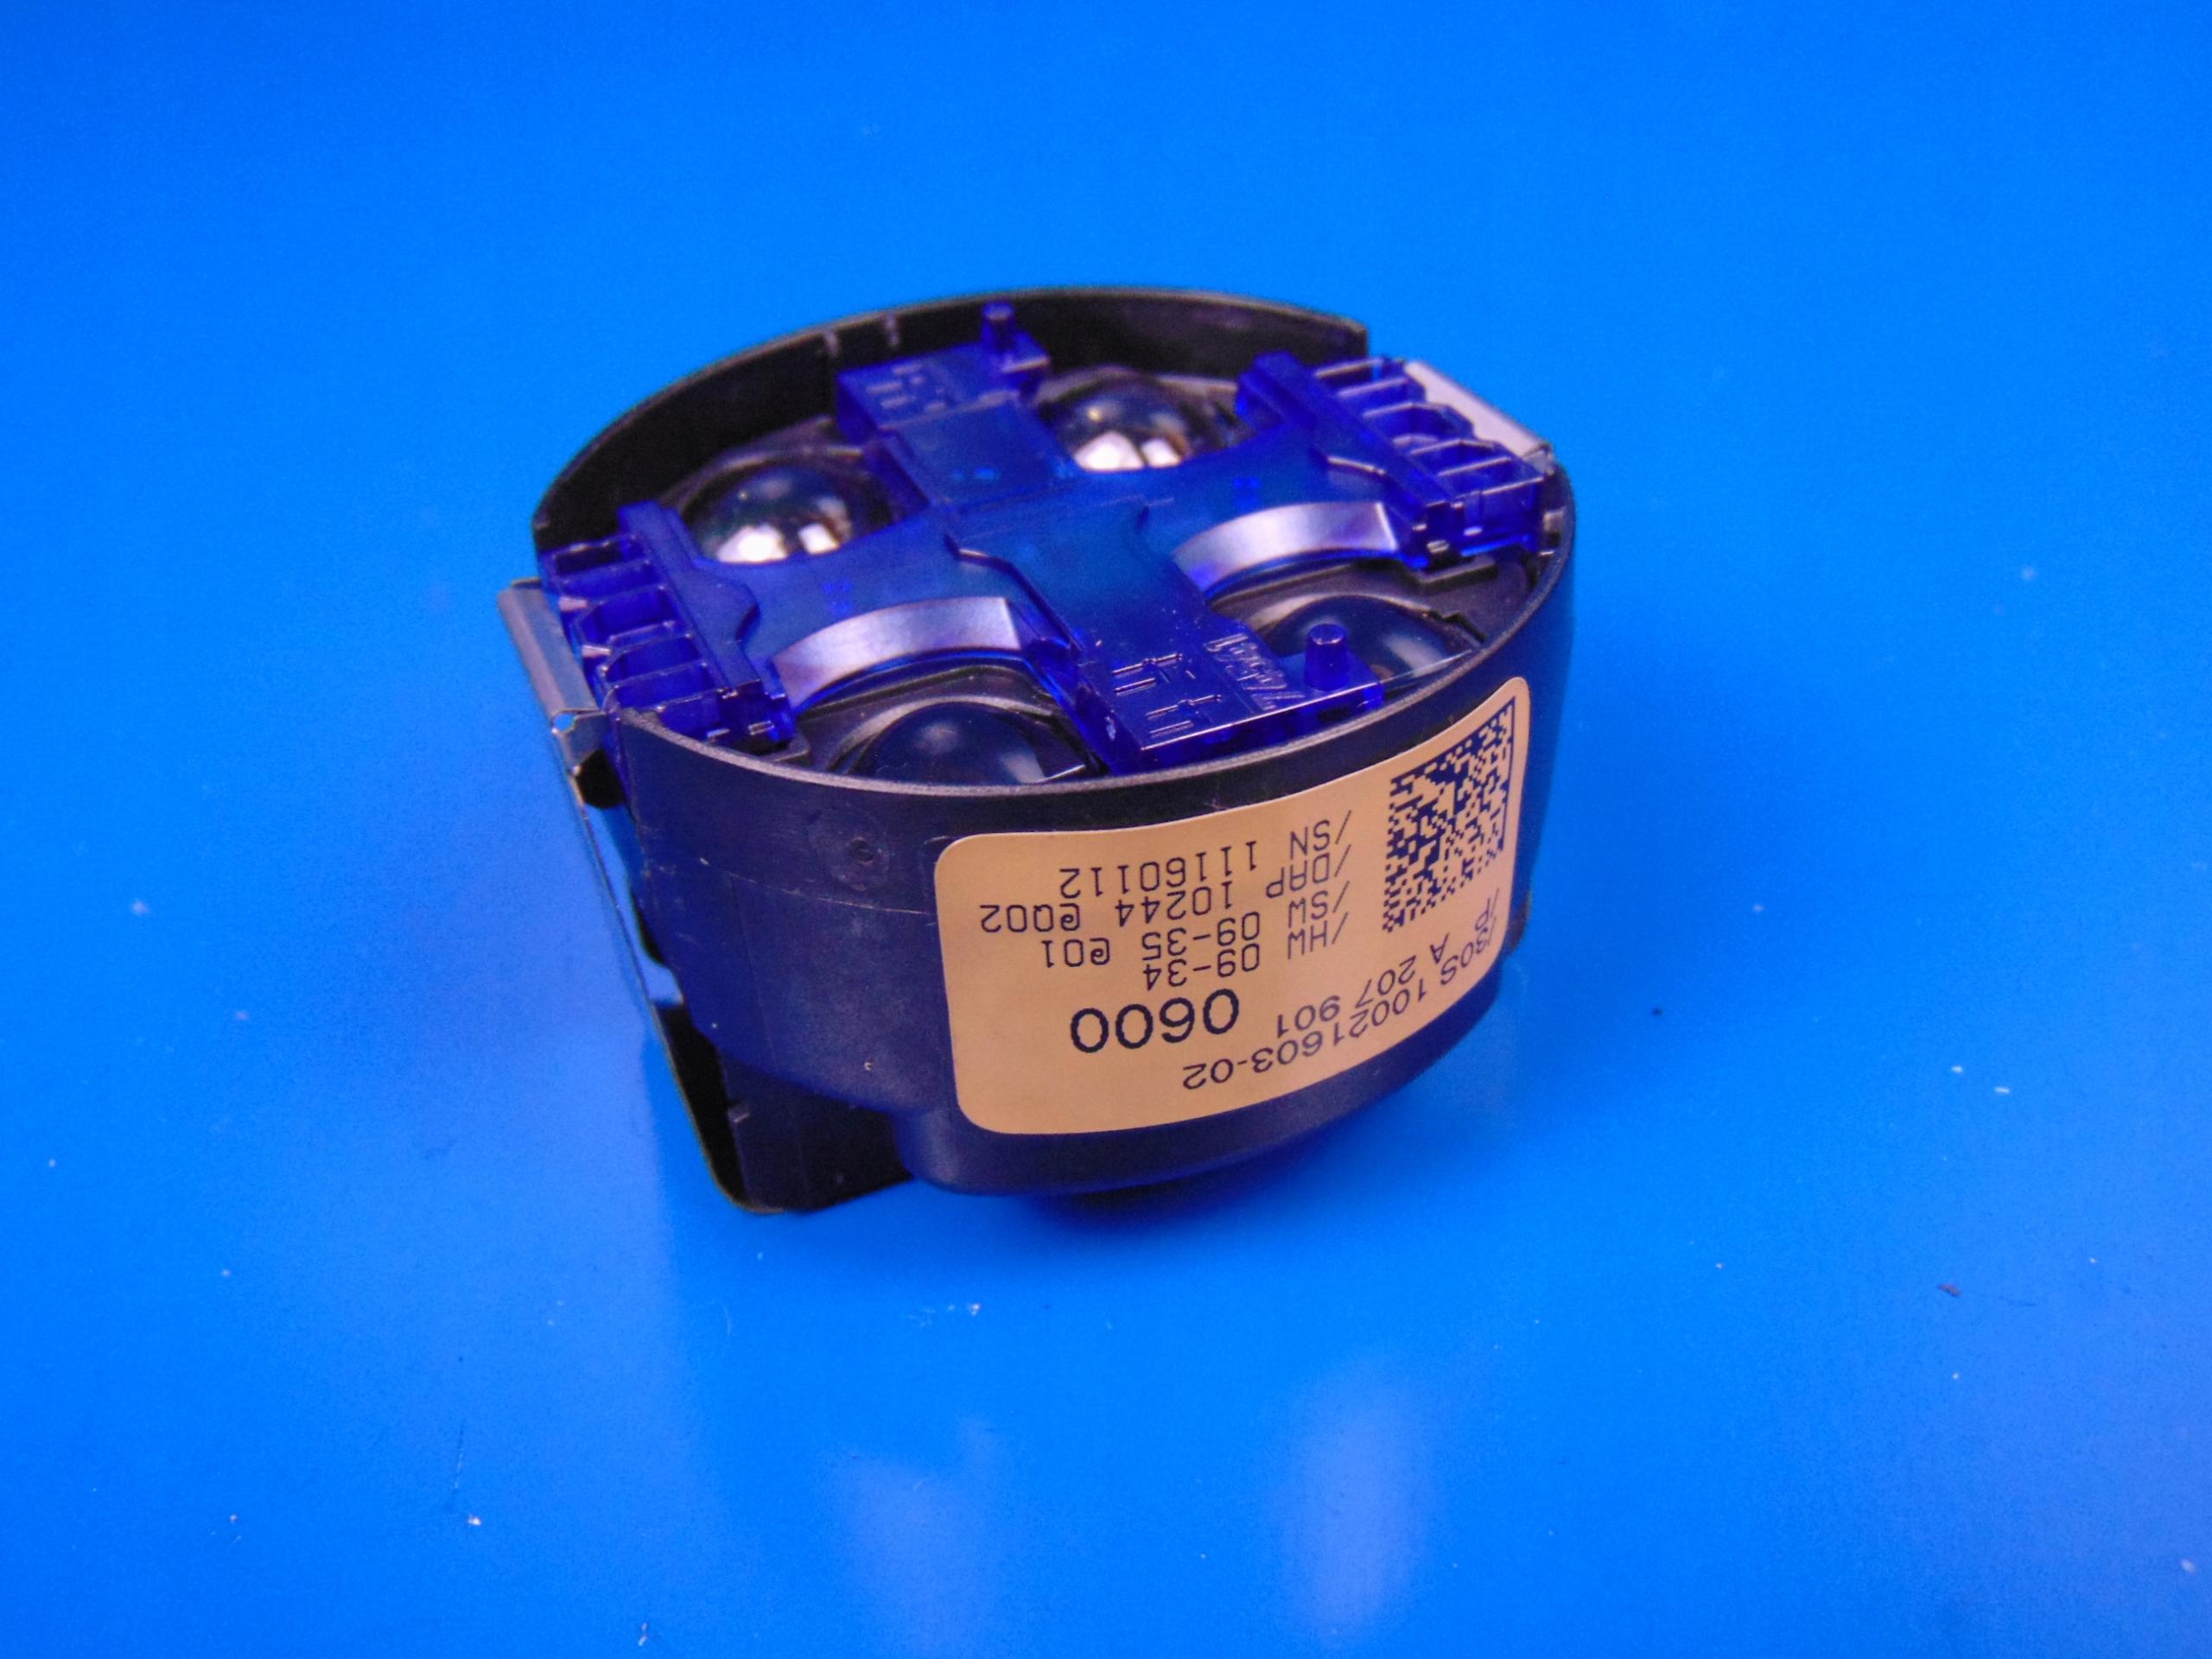 mercedes w212 w204 cls датчик сенсор дождь